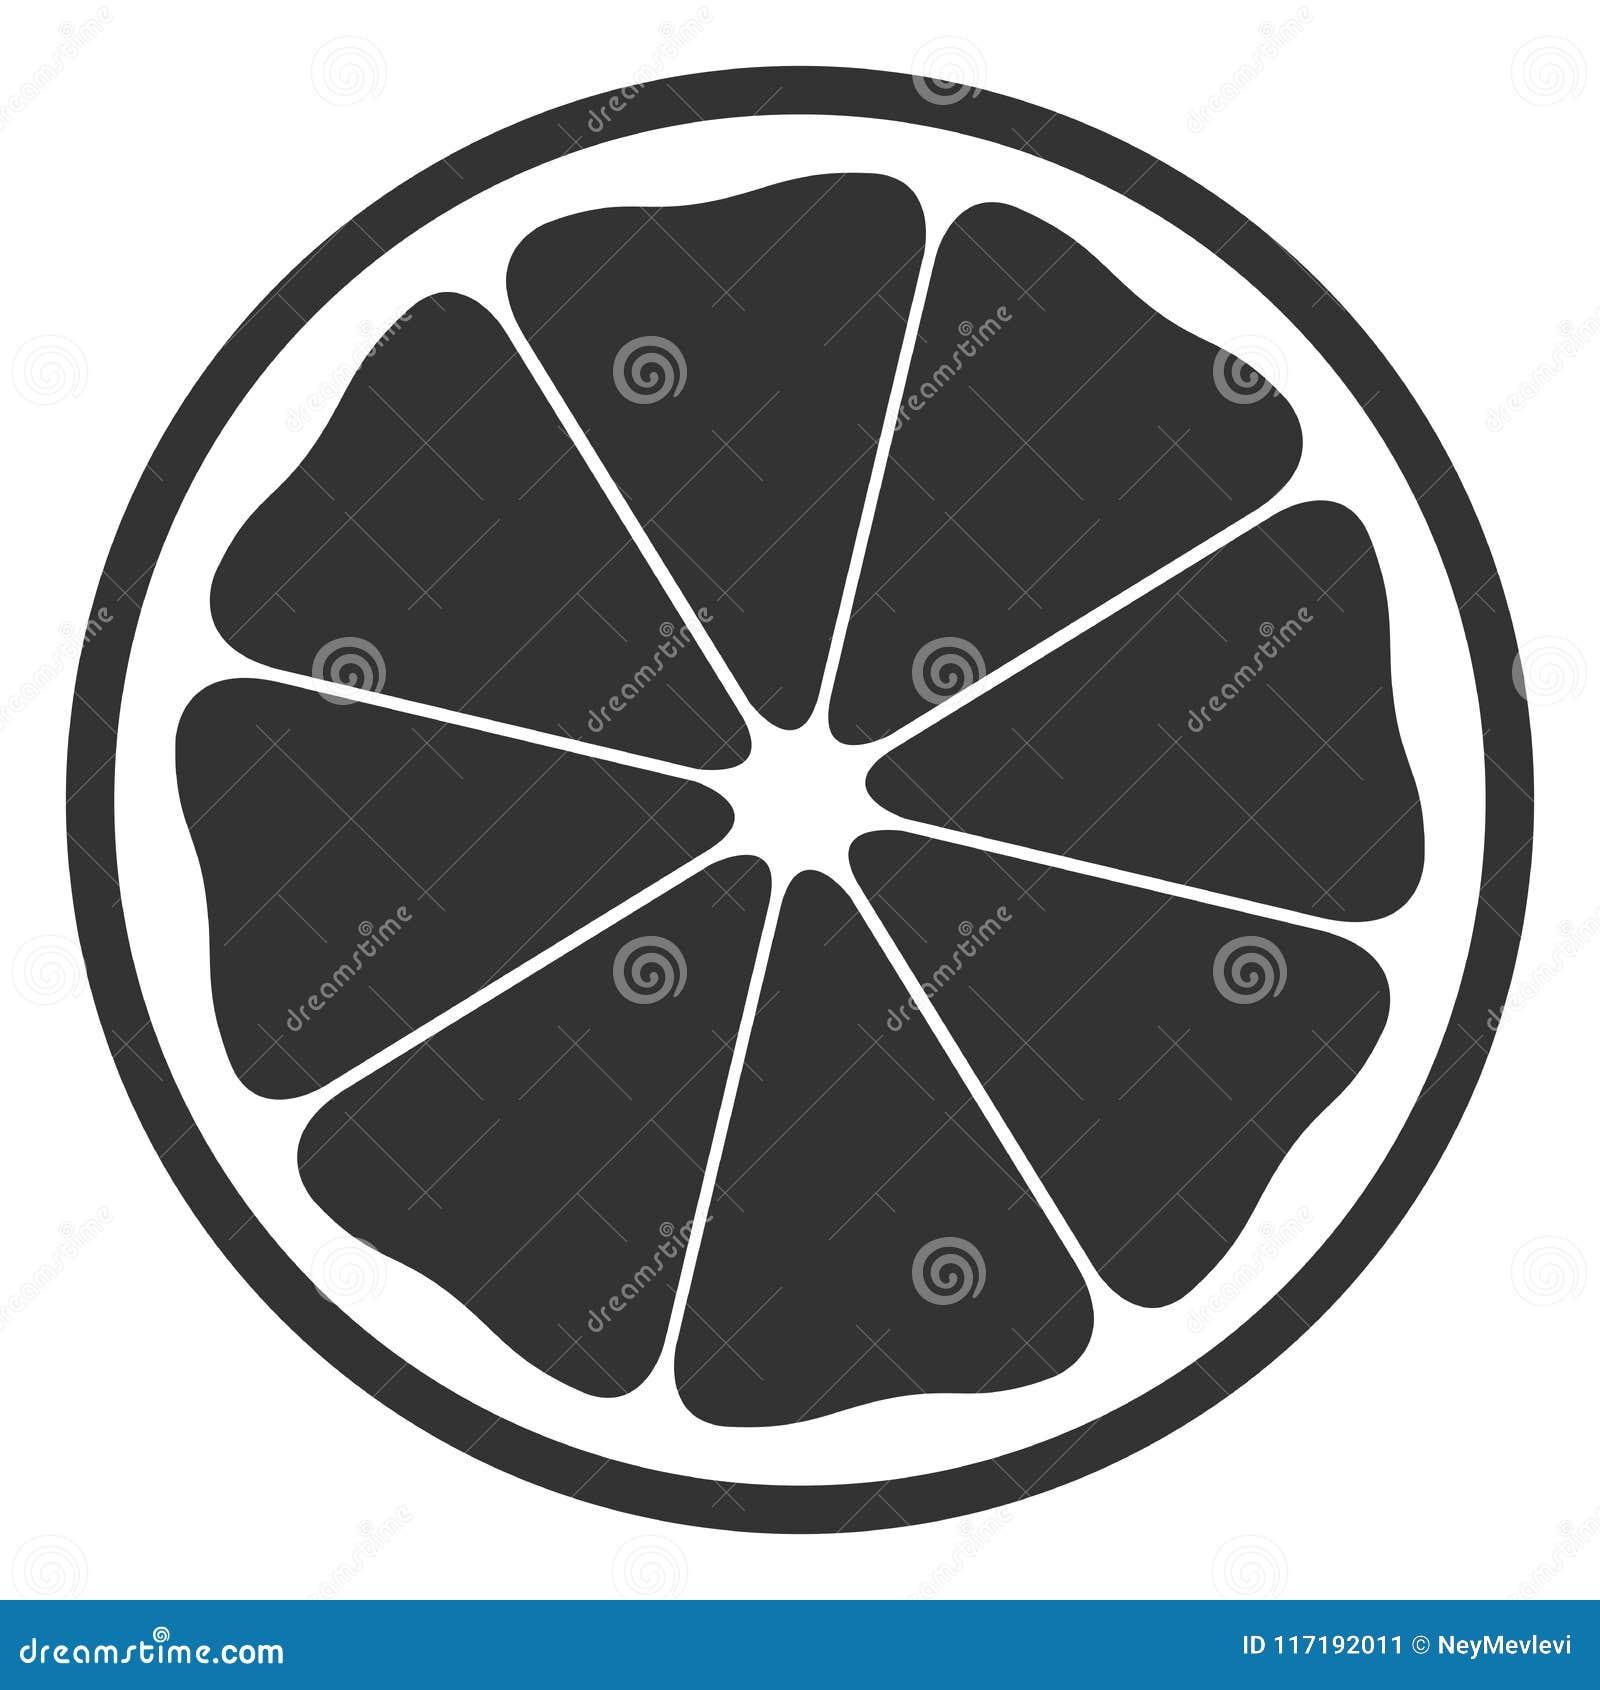 Black And White Half Orange Symbol Stock Vector Illustration Of